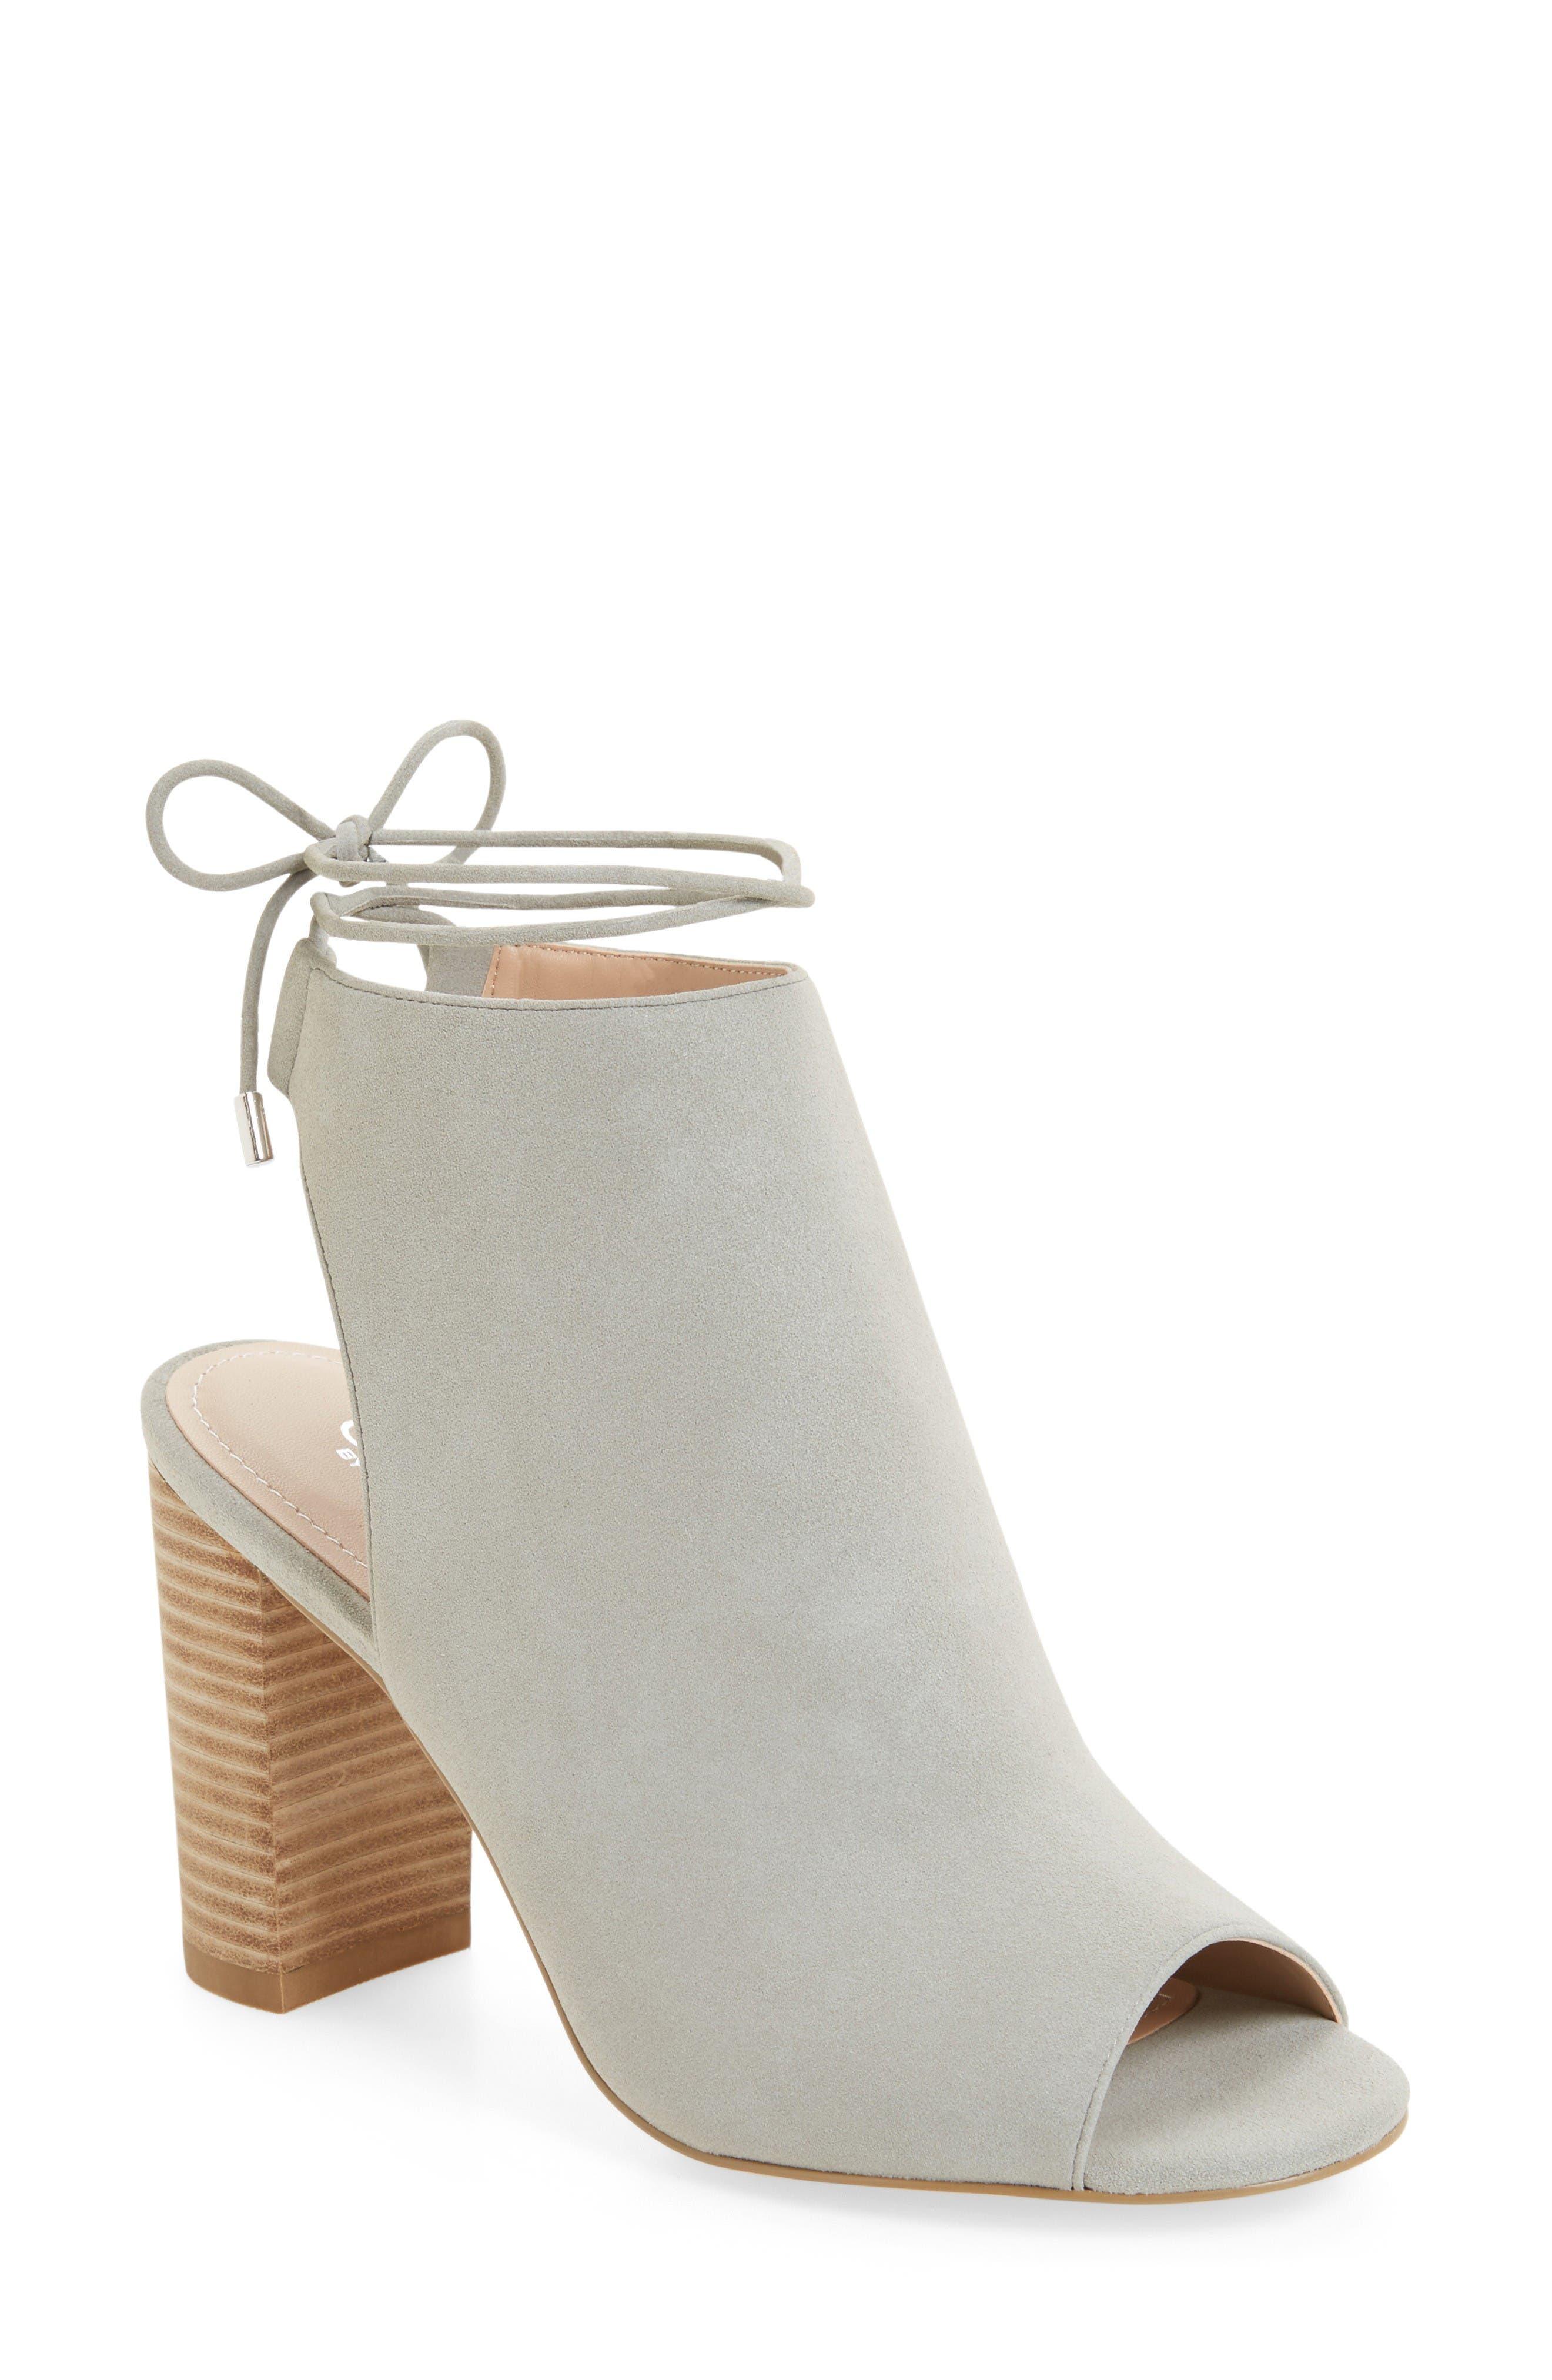 CHARLES BY CHARLES DAVID Elista Ankle Wrap Sandal